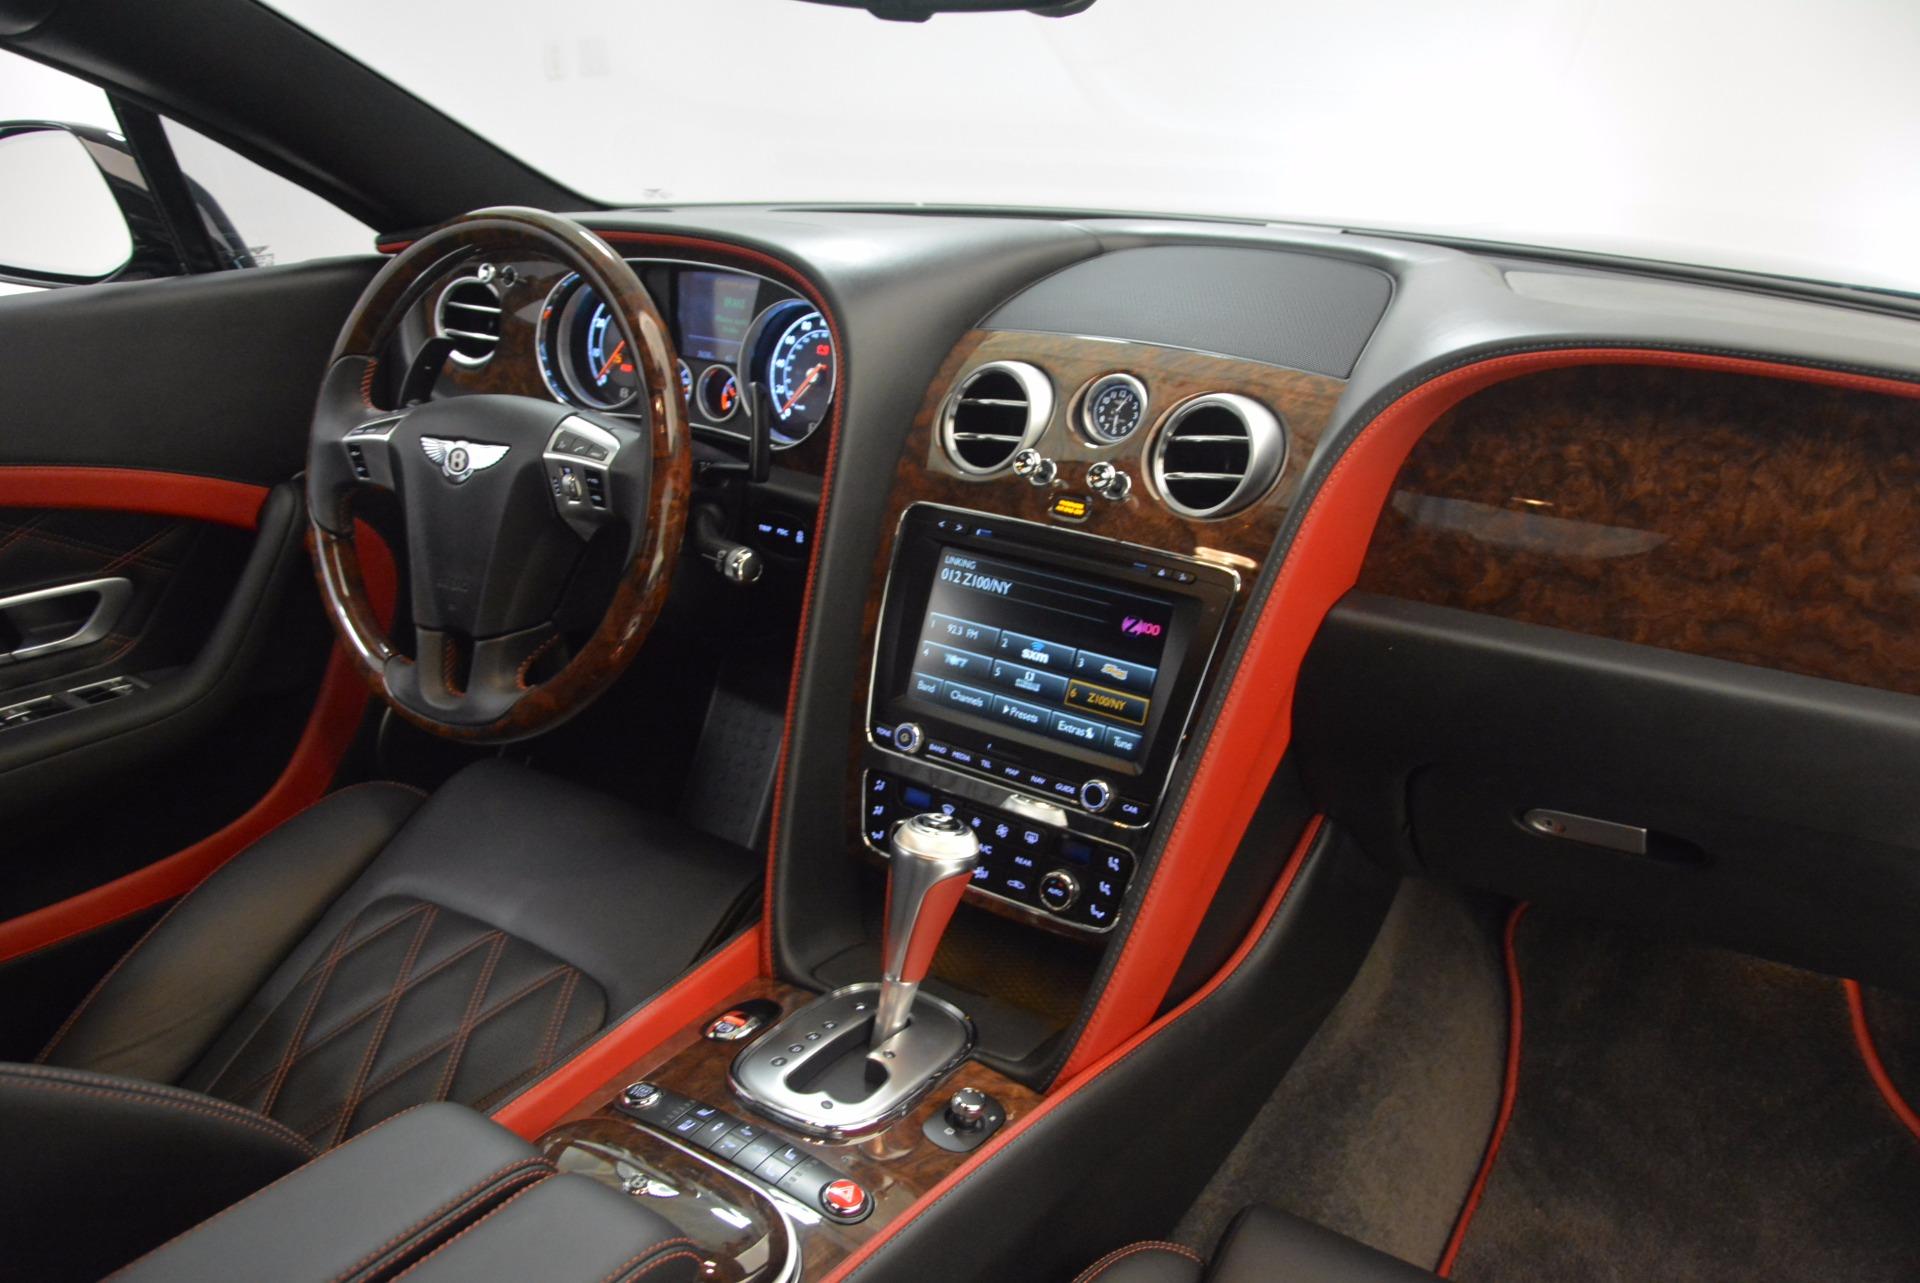 Used 2015 Bentley Continental GT Speed For Sale In Westport, CT 1646_p30